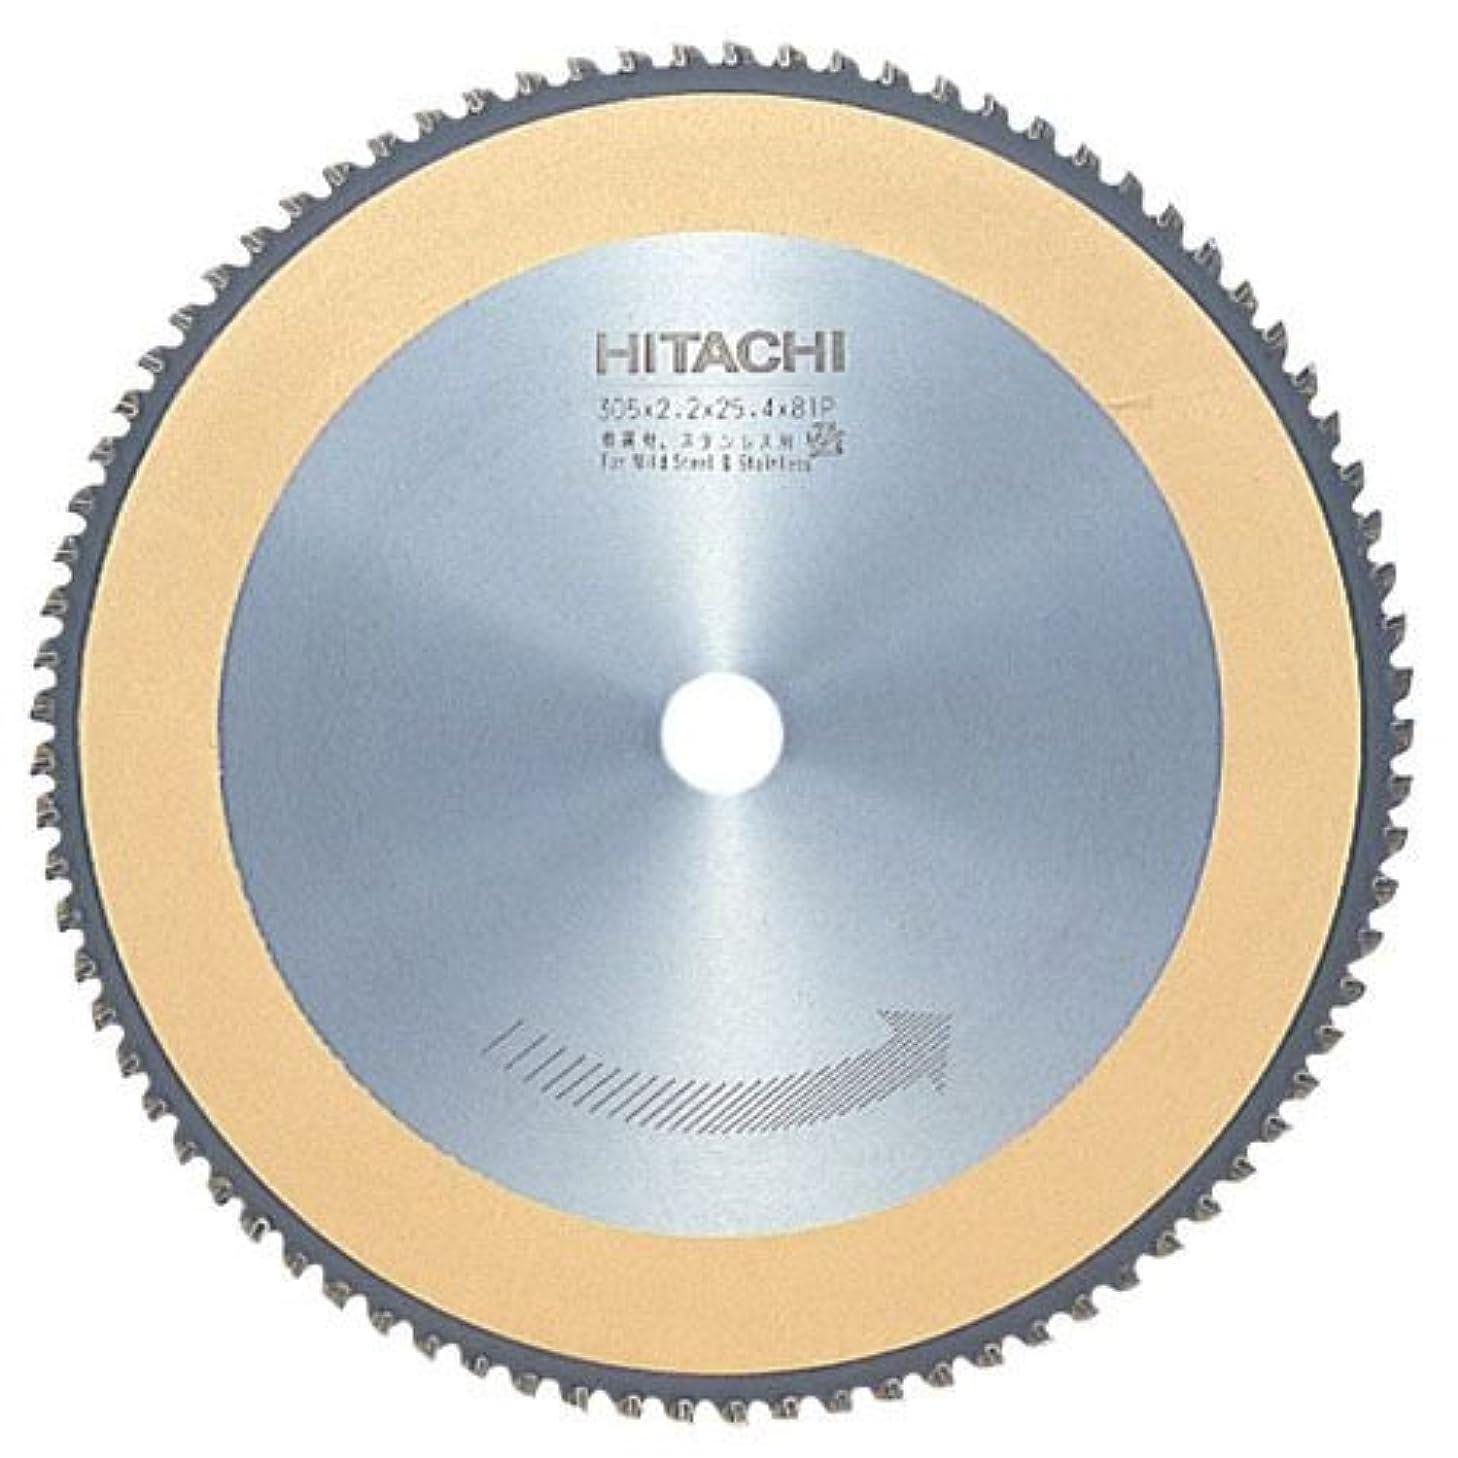 HiKOKI(ハイコーキ) 旧日立工機  チップソー(軟鋼材ステンレス) 305mm×25.4 81枚 0031-6037